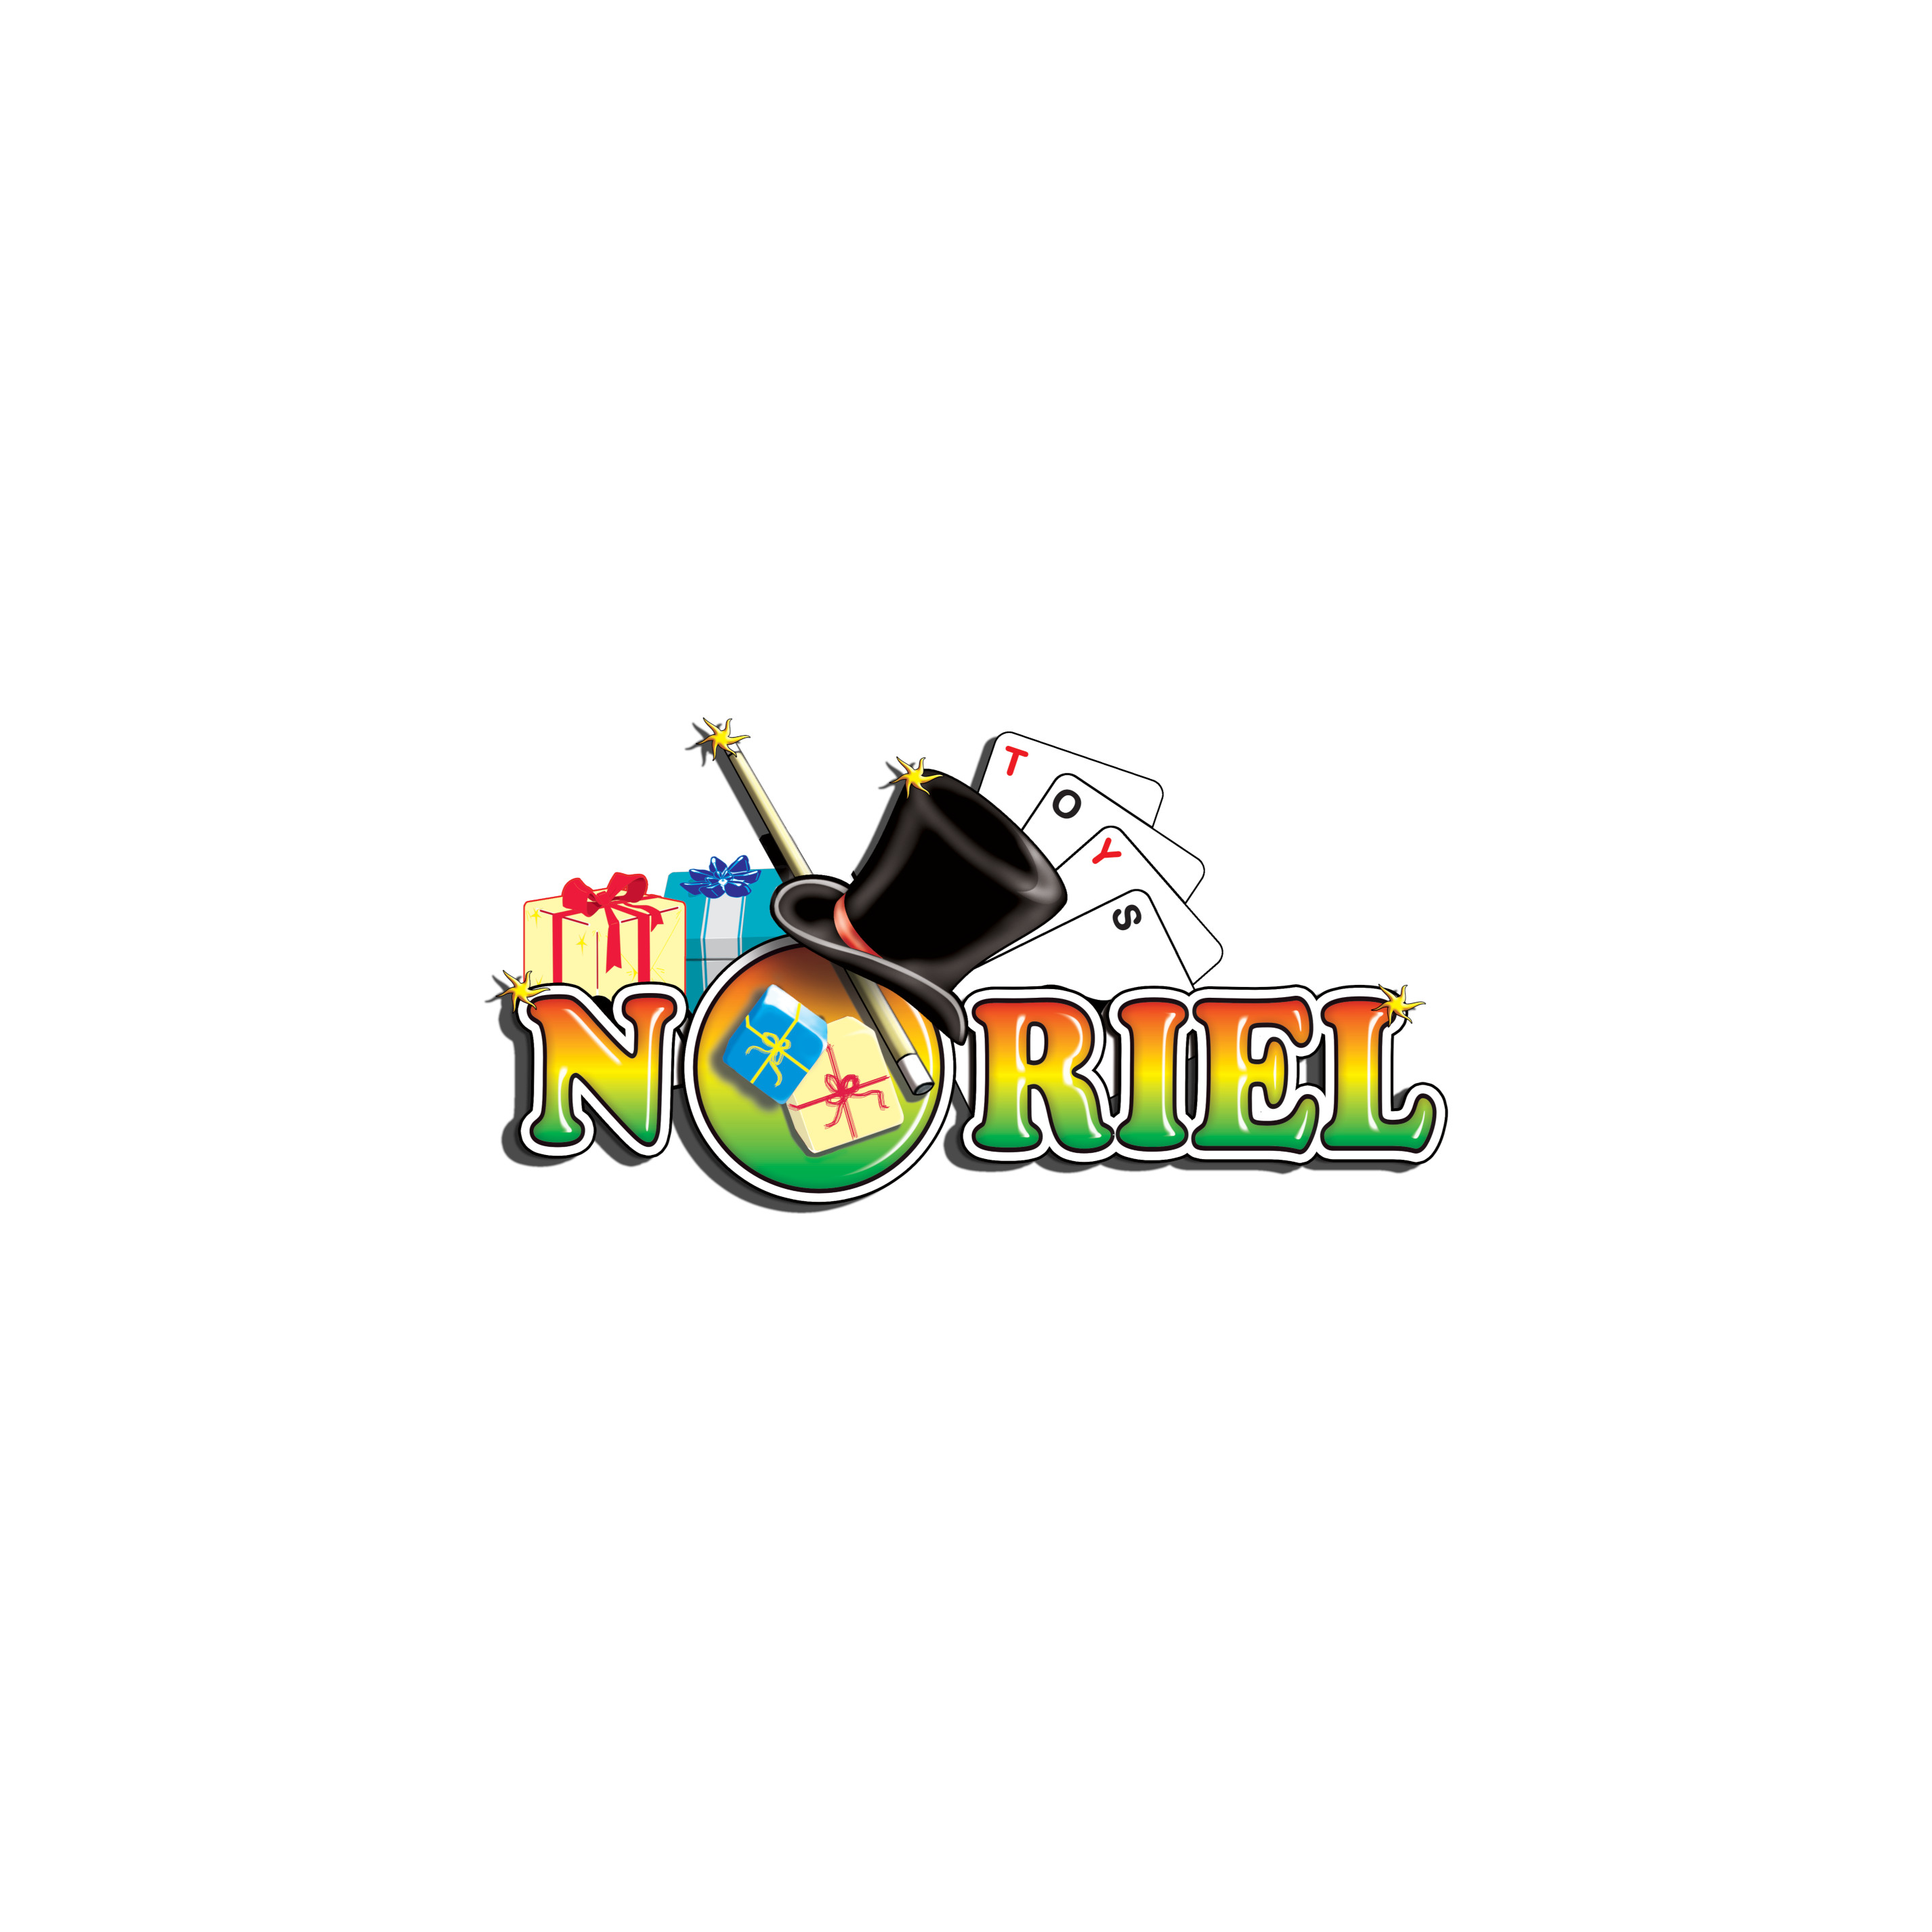 74941 - Set accesorii Incredibles 2 - Masca, manusi si emblema